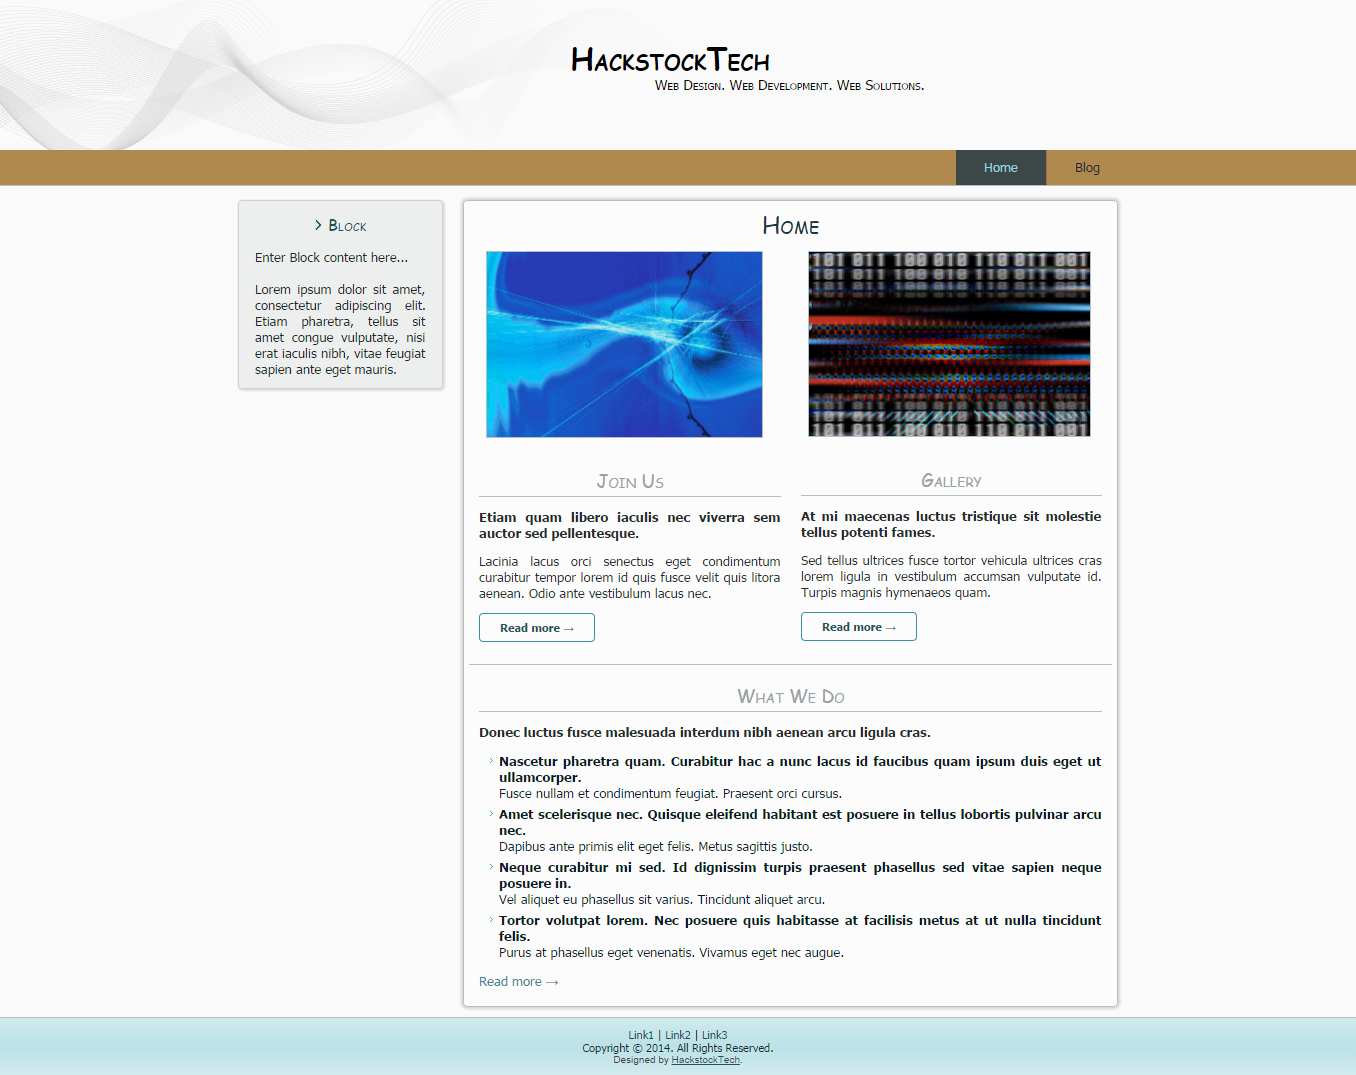 Simple Fun Business | HackstockTech | Web Design | Themes, templates ...